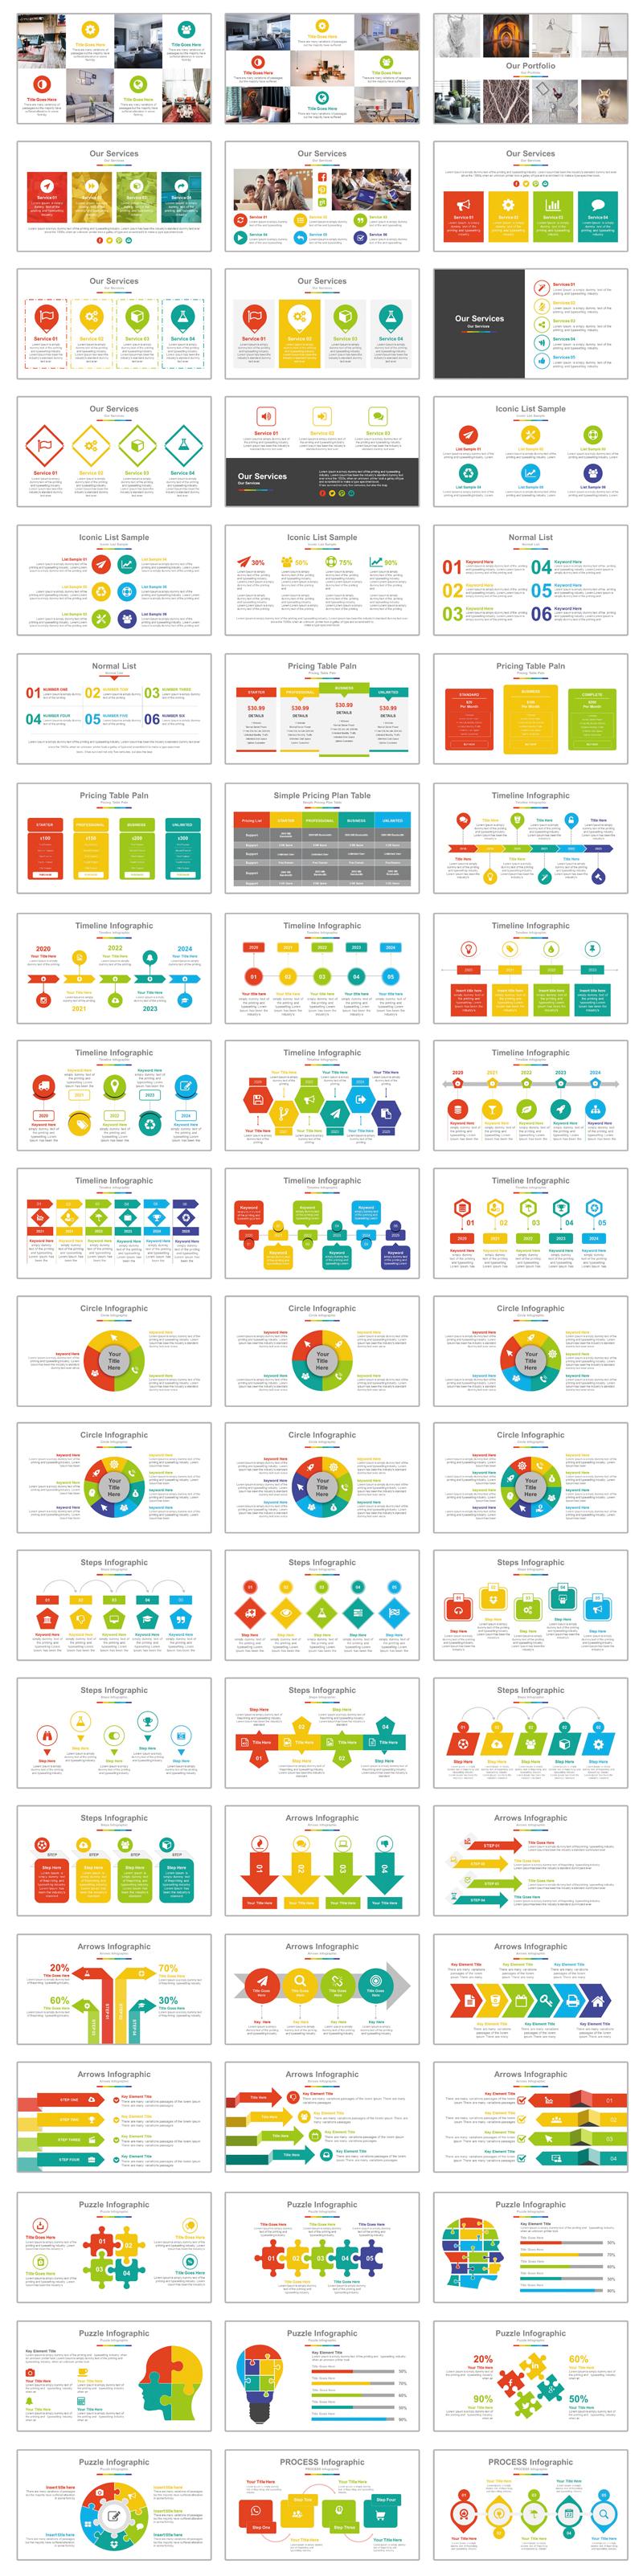 Best Business Presentation PowerPoint Template